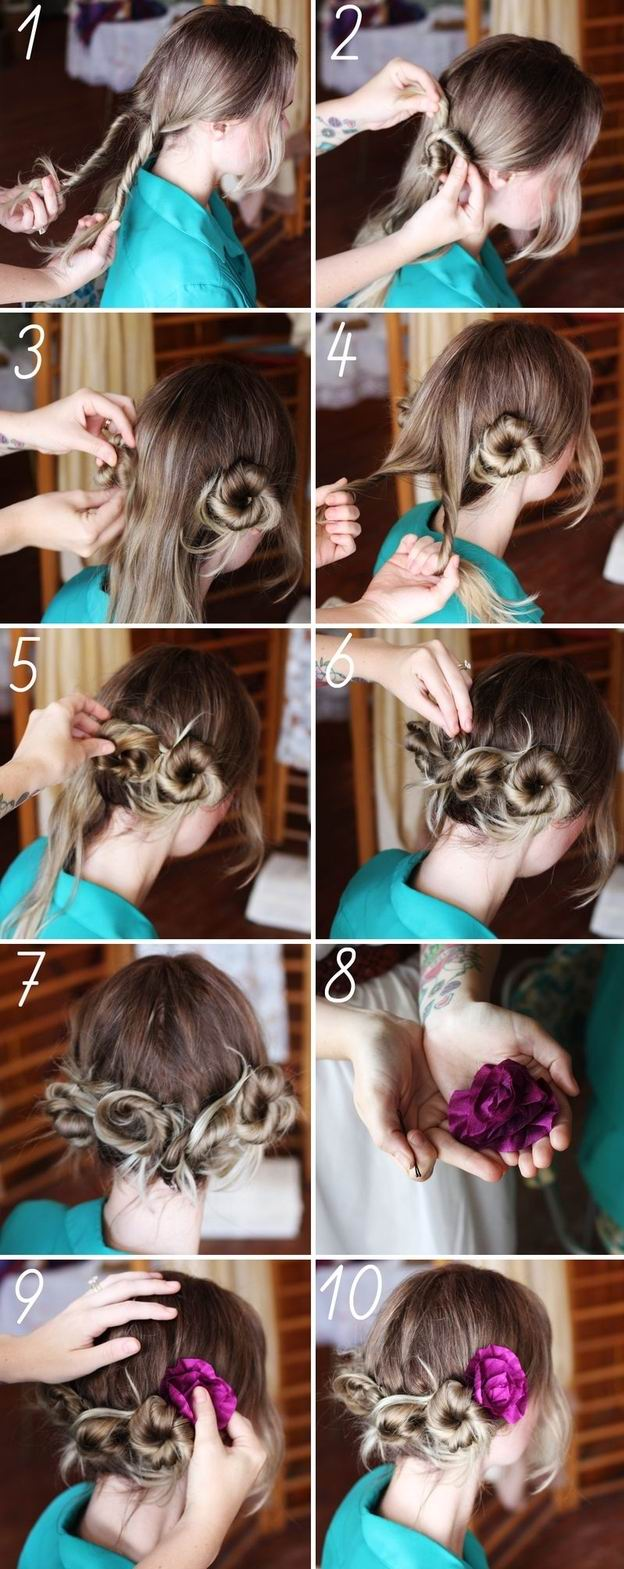 Hair Tutorial How to Create Twisty Buns